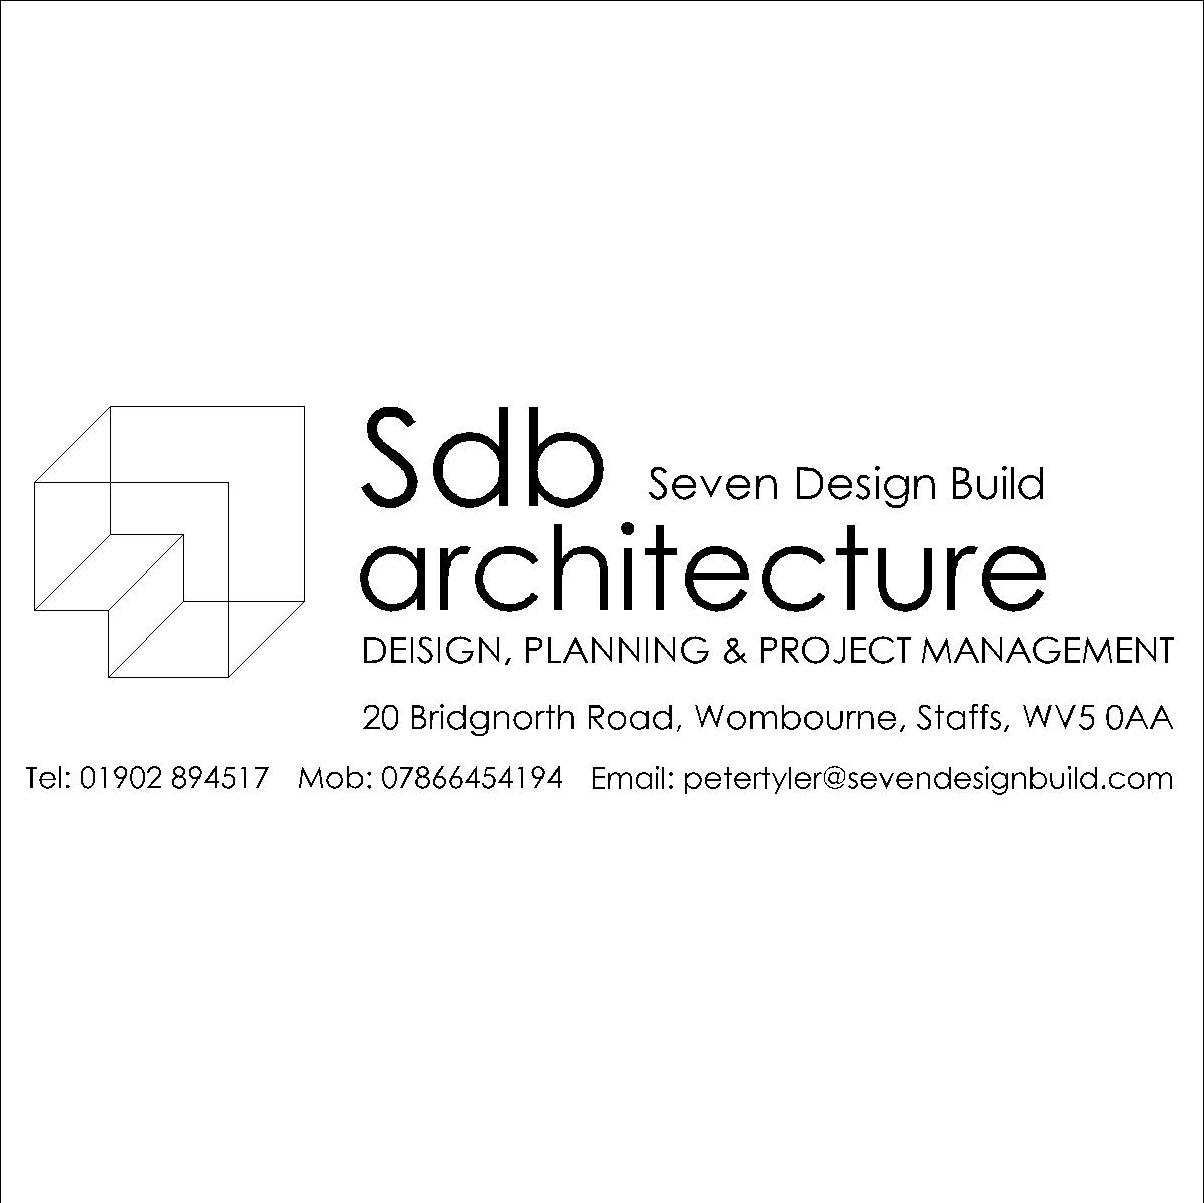 Seven Design Build